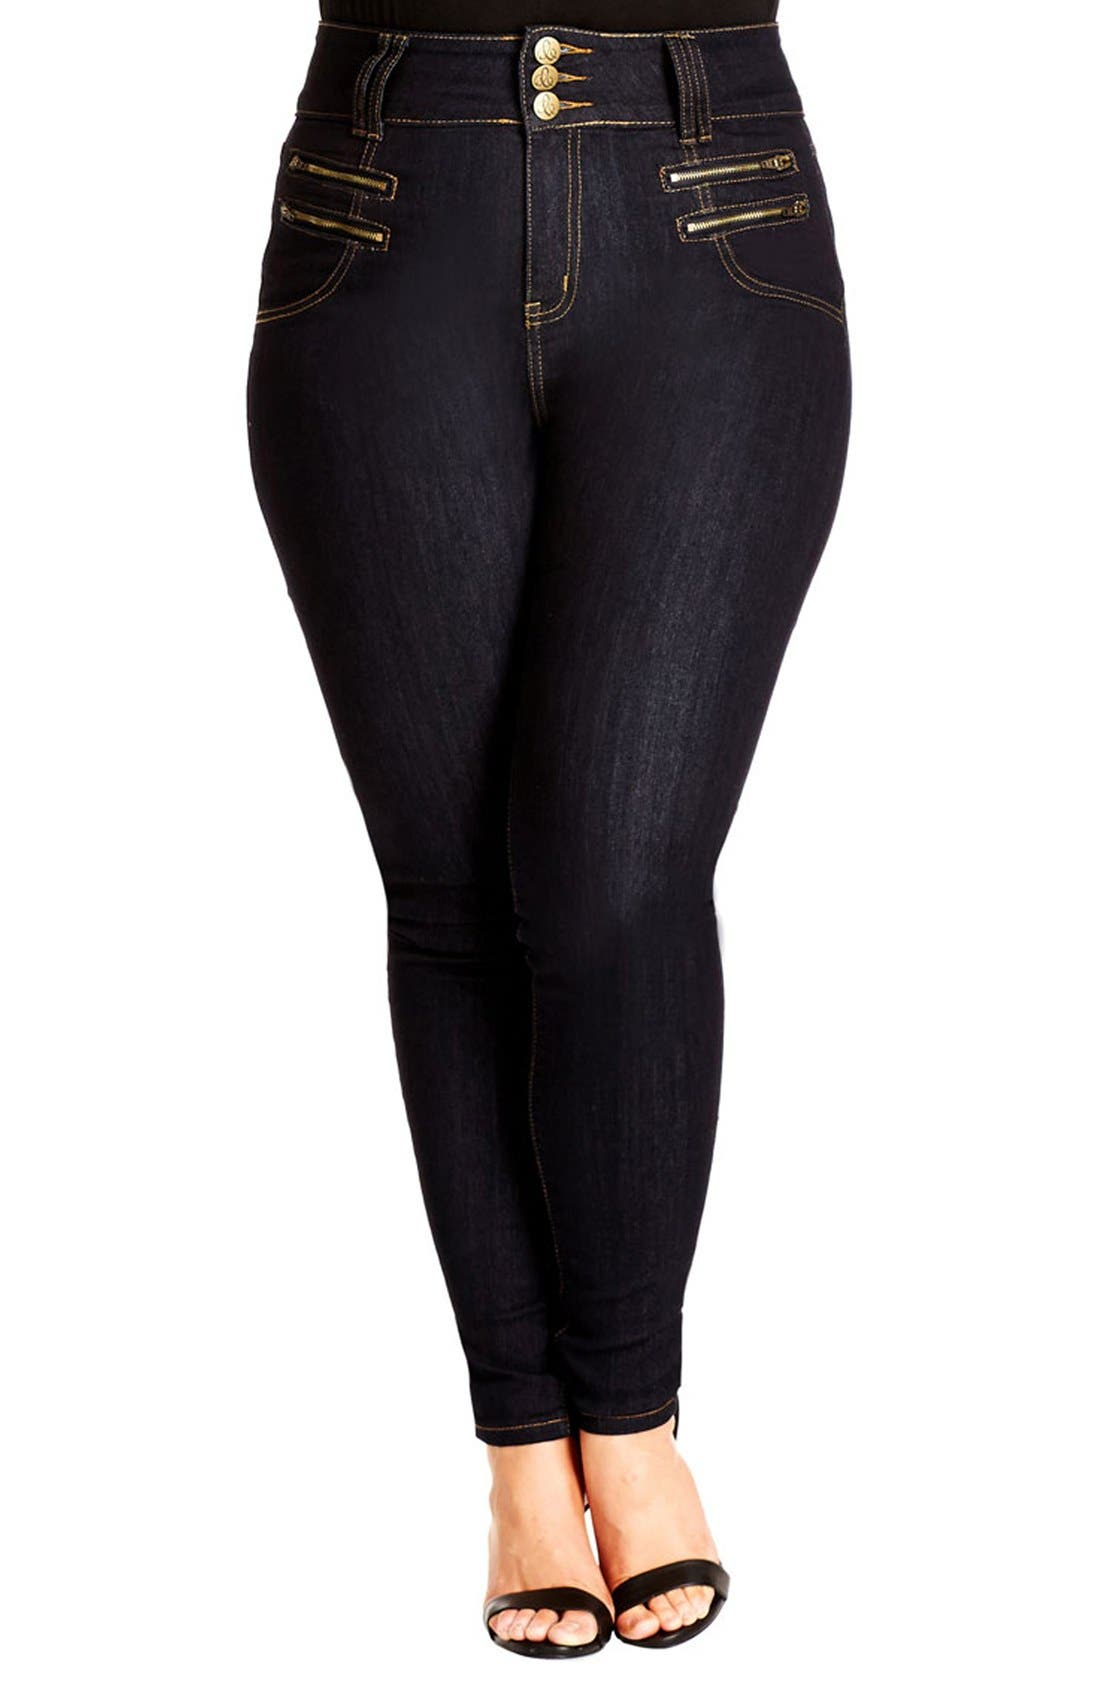 Main Image - City Chic 'Slim Me' Skinny Jeans (Dark Denim) (Plus Size)